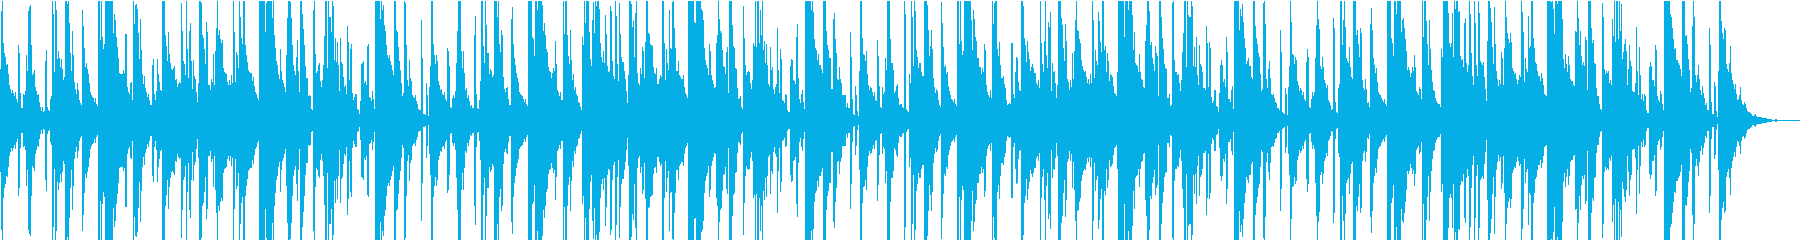 Vlog、実況、説明、商品紹介系BGM5の再生済みの波形